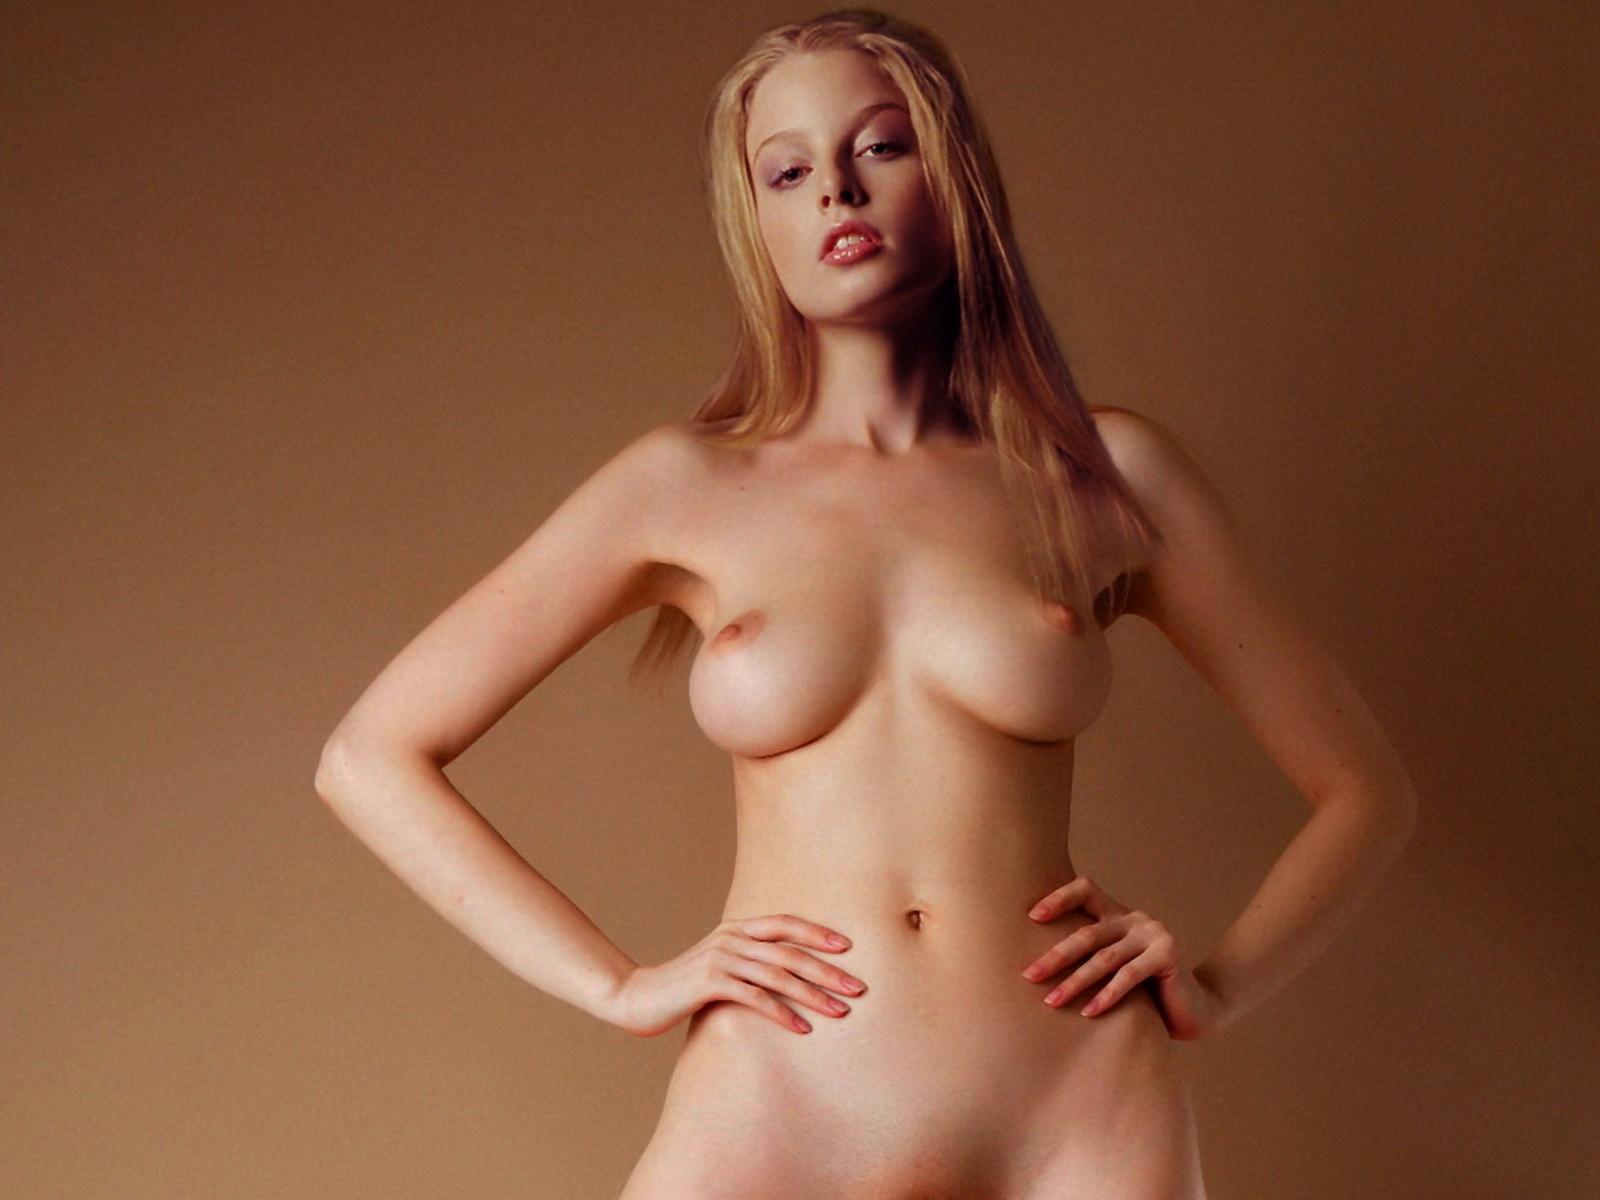 Rachel Nichols Zoe Saldana Nude